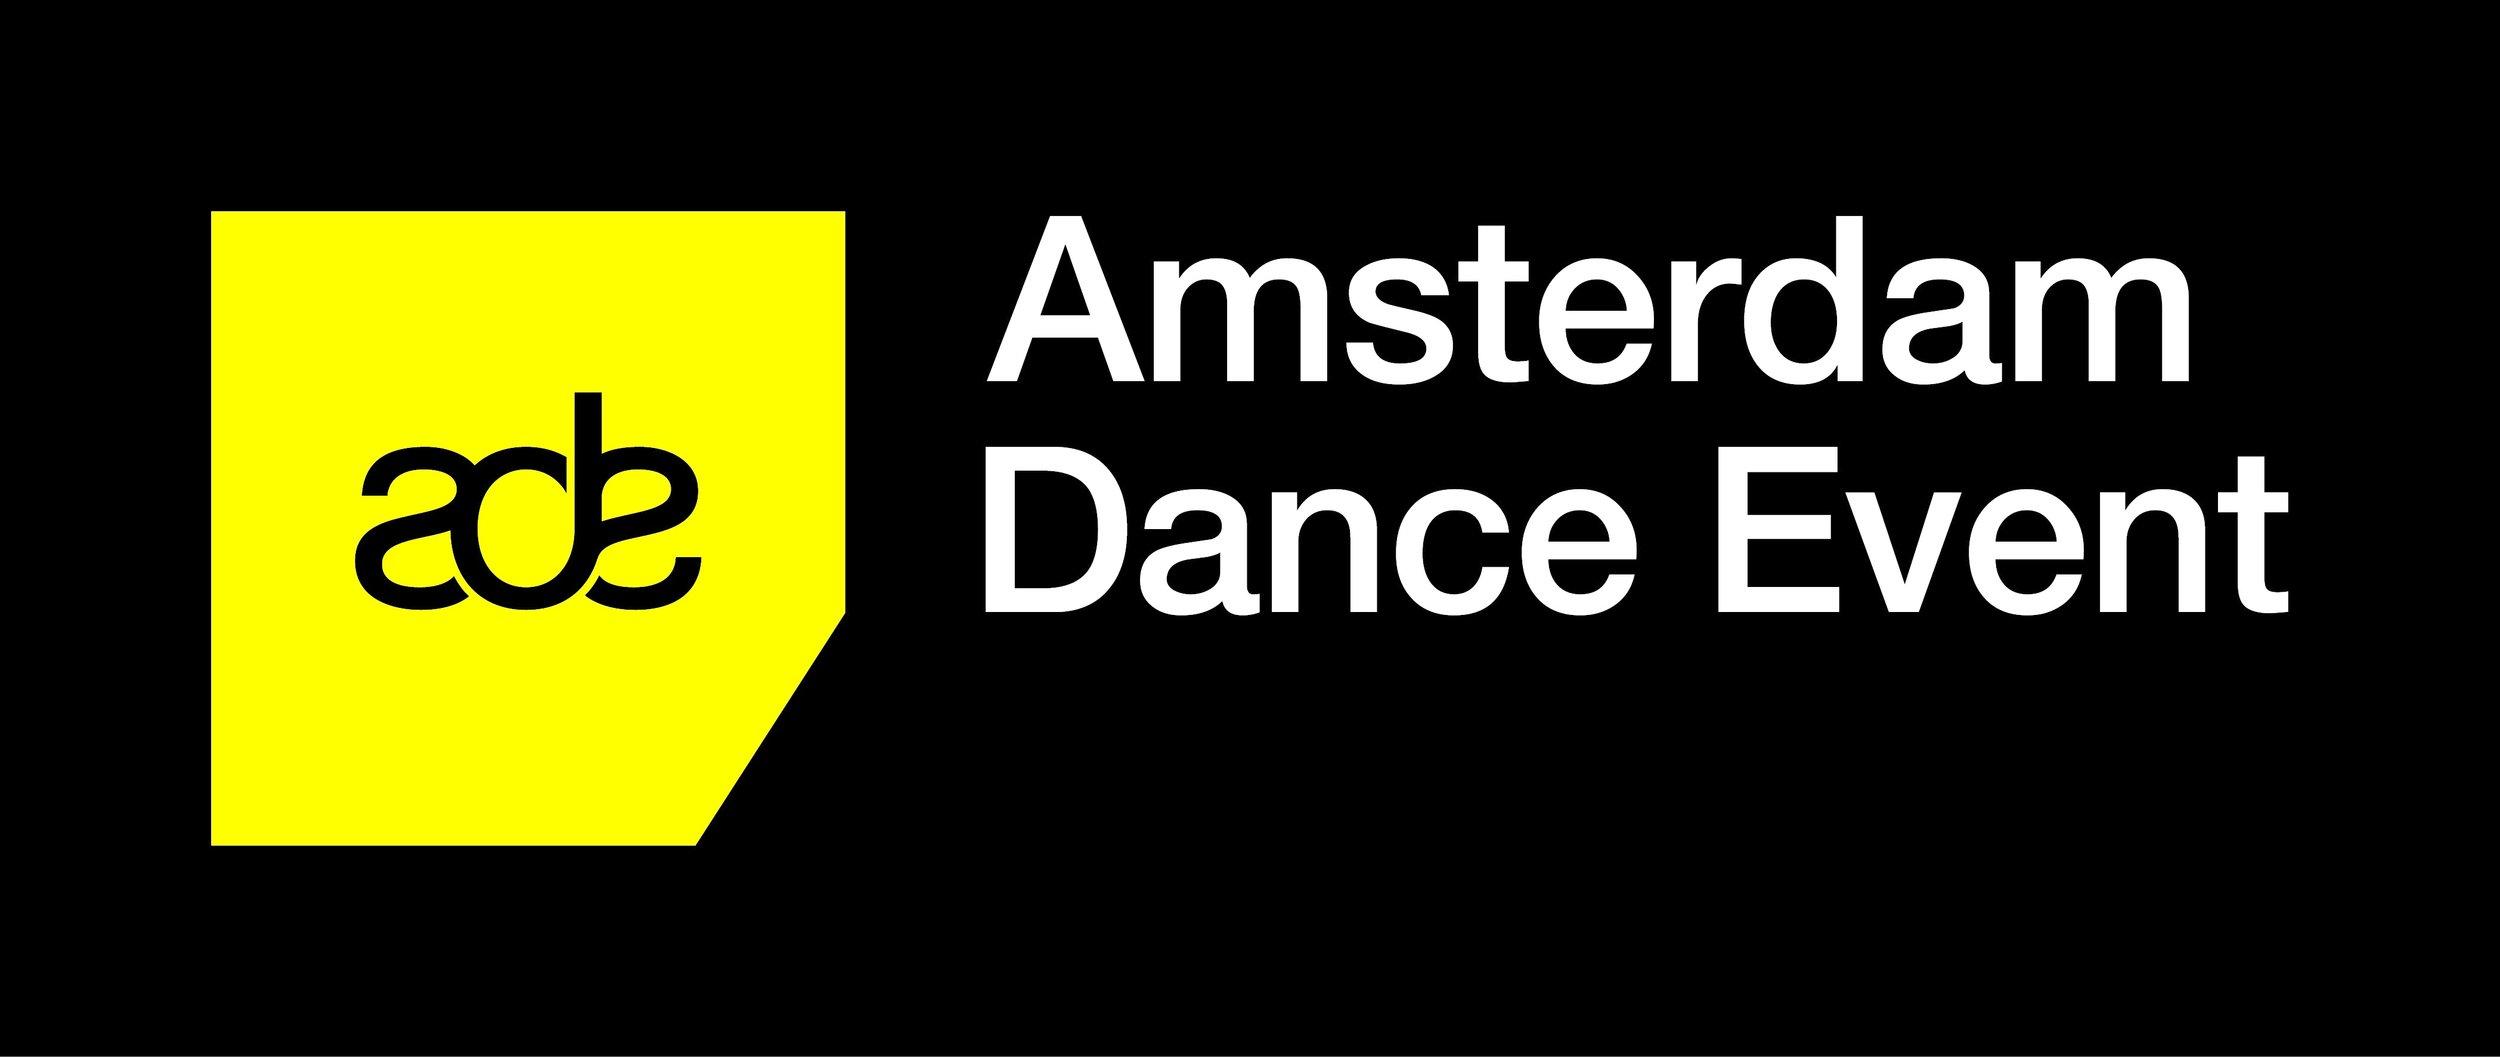 Amsterdam-Dance-Event.jpg